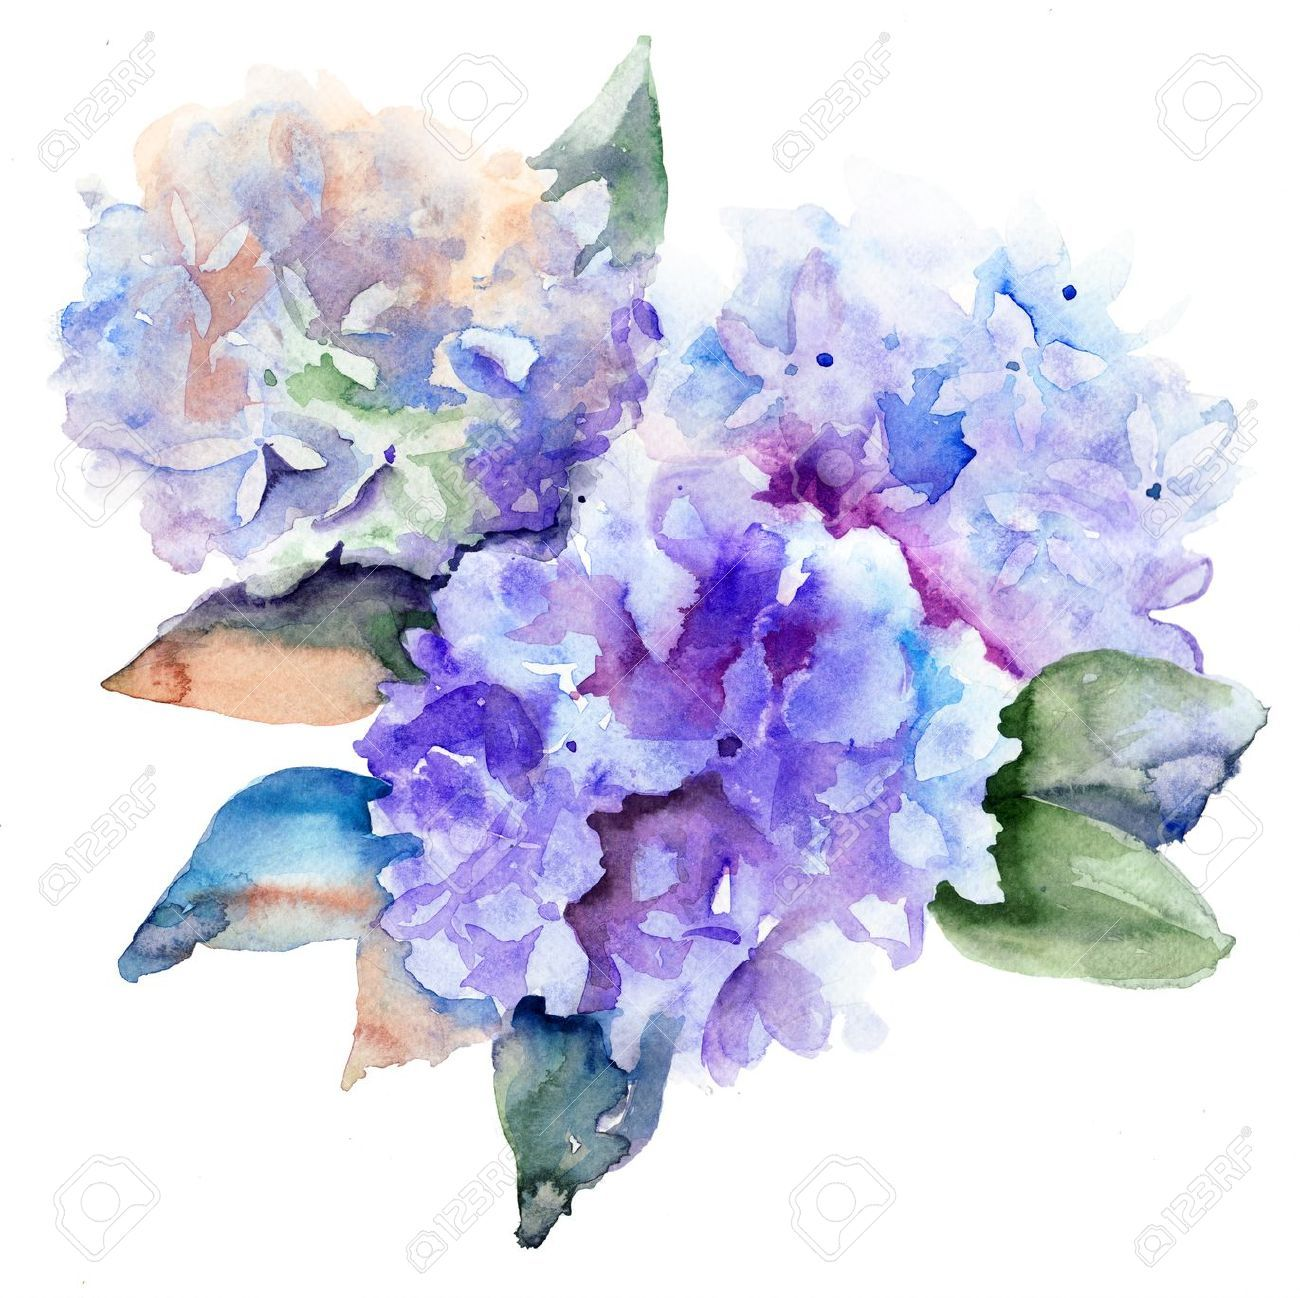 Beauty Flowers in Watercolour Paintings by Russian Artist Elena Buscar con